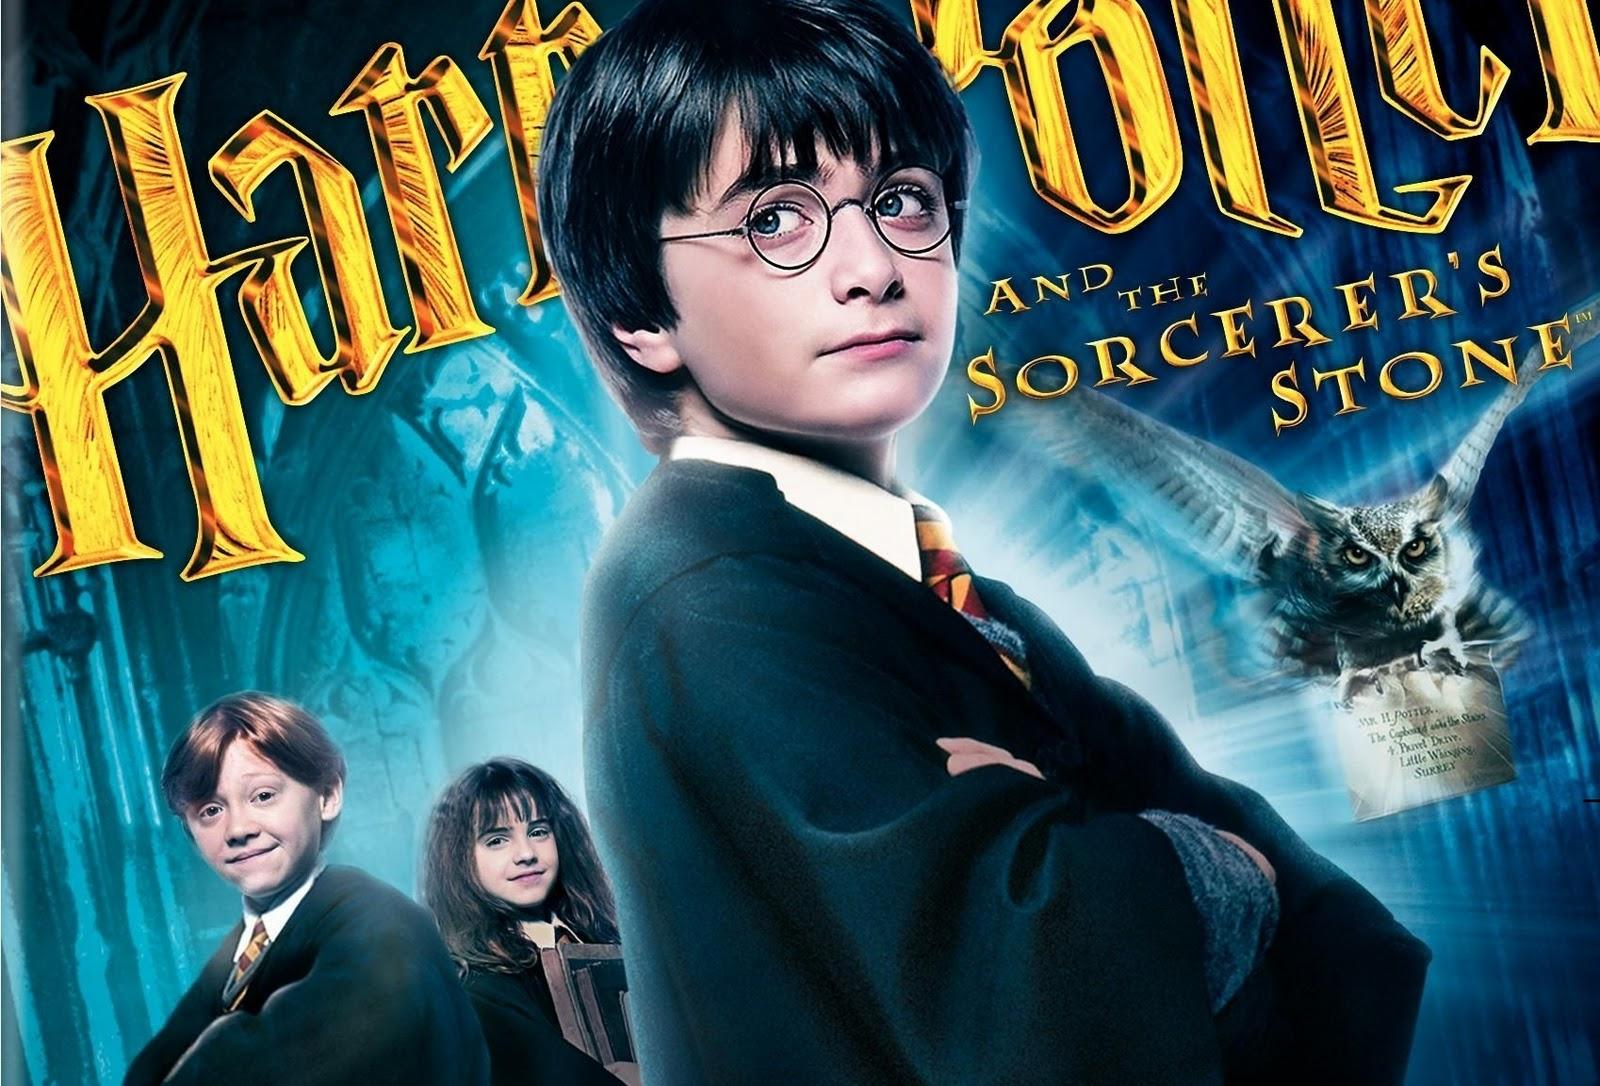 Harry Potter É A Pedra Filosofal within harry potter e a pedra filosofal: facebook e twitter celebram 20